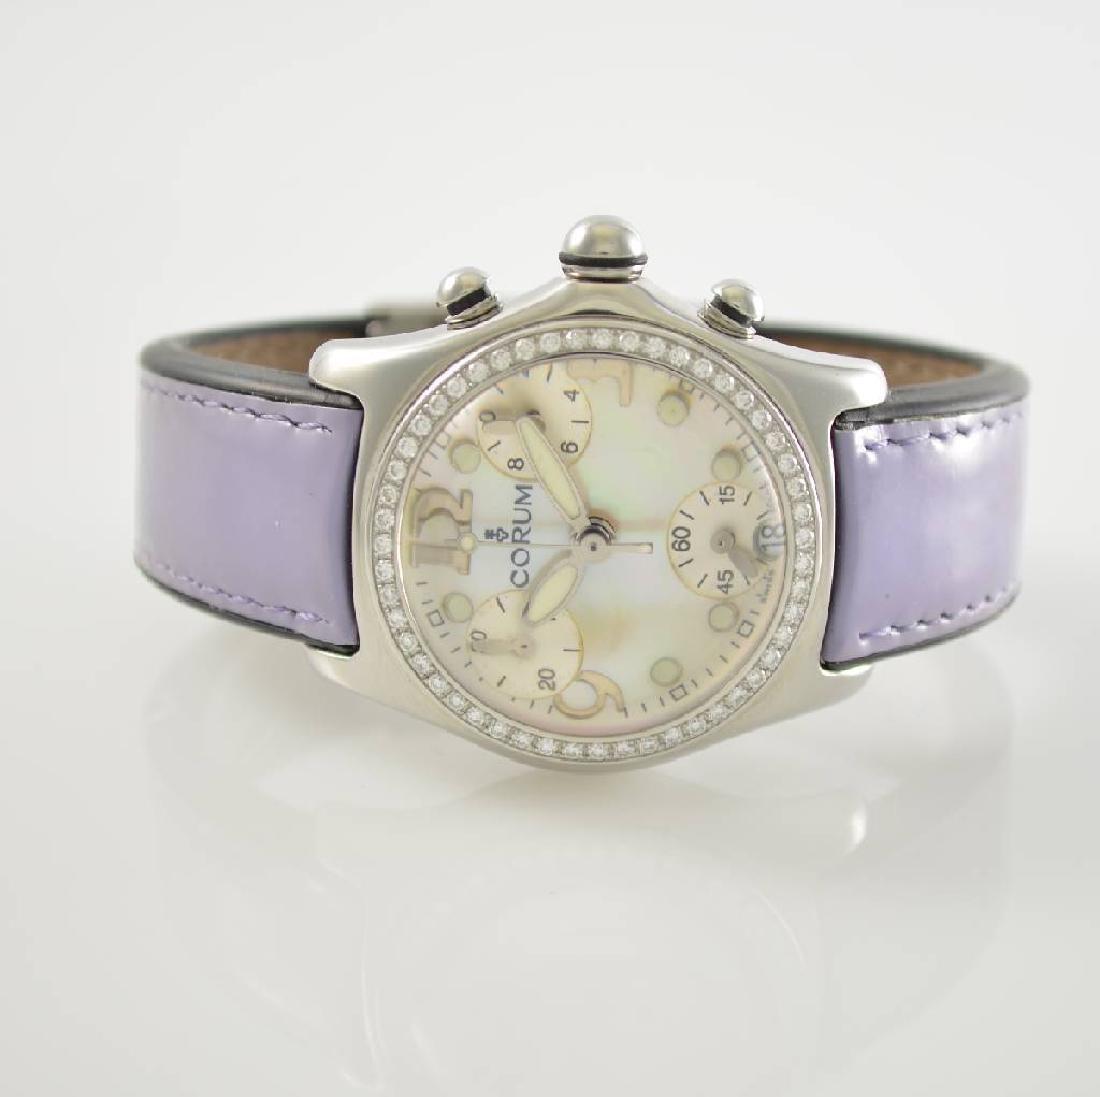 CORUM Bubble chronograph ladies wristwatch